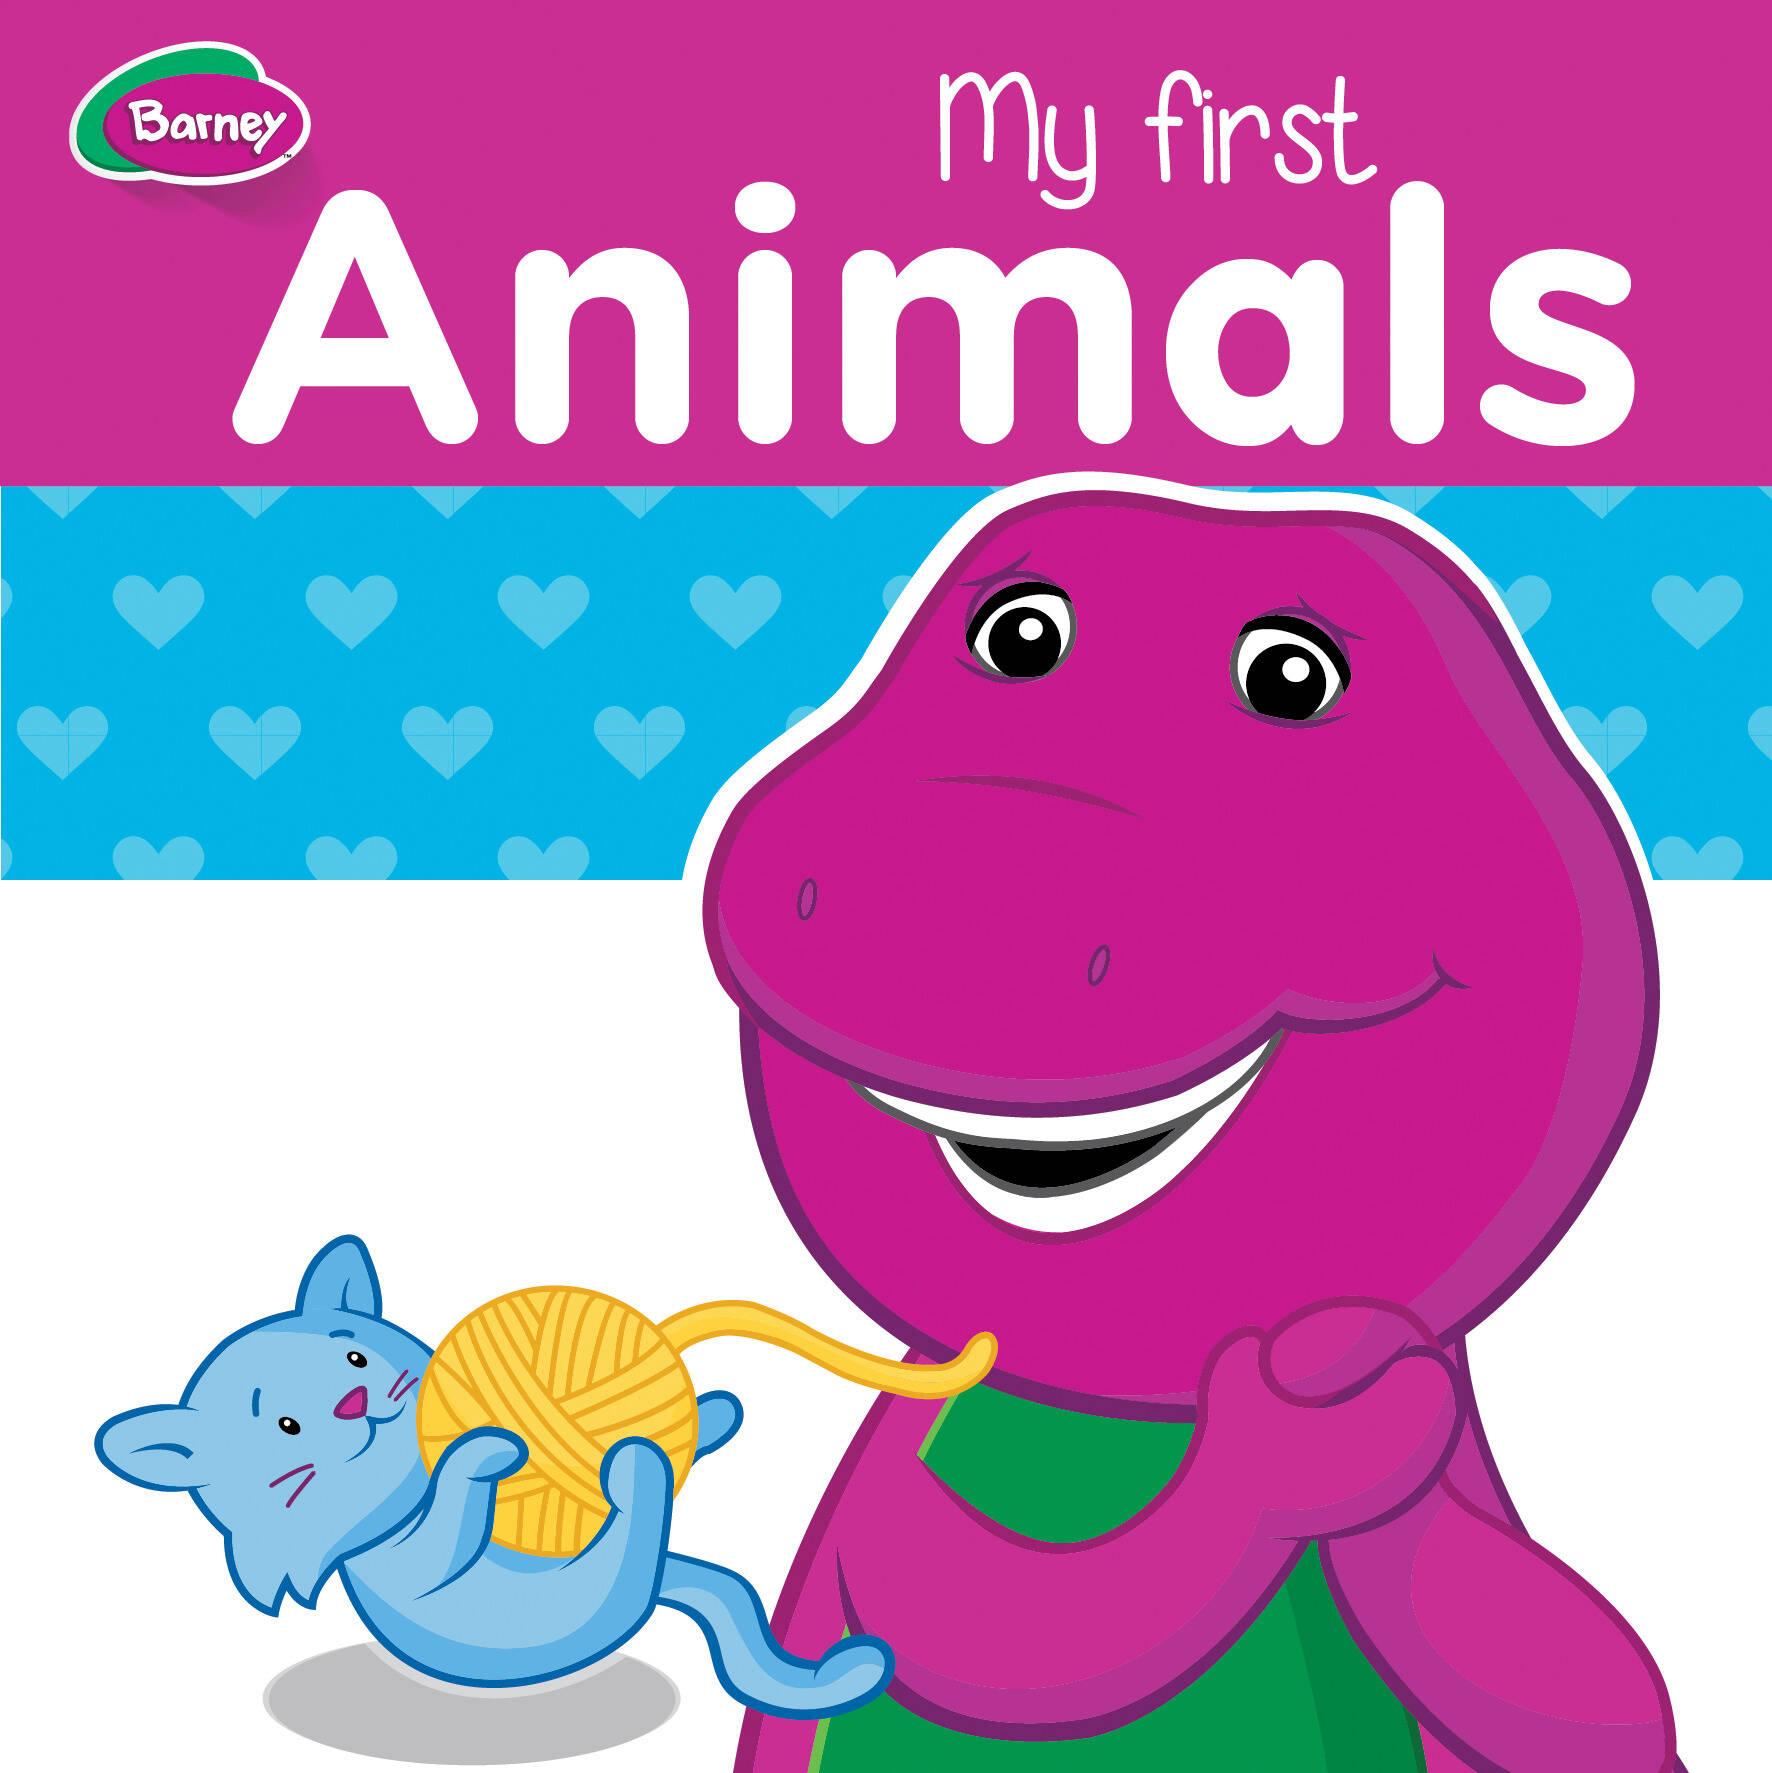 Barney Board Book - My First Animals